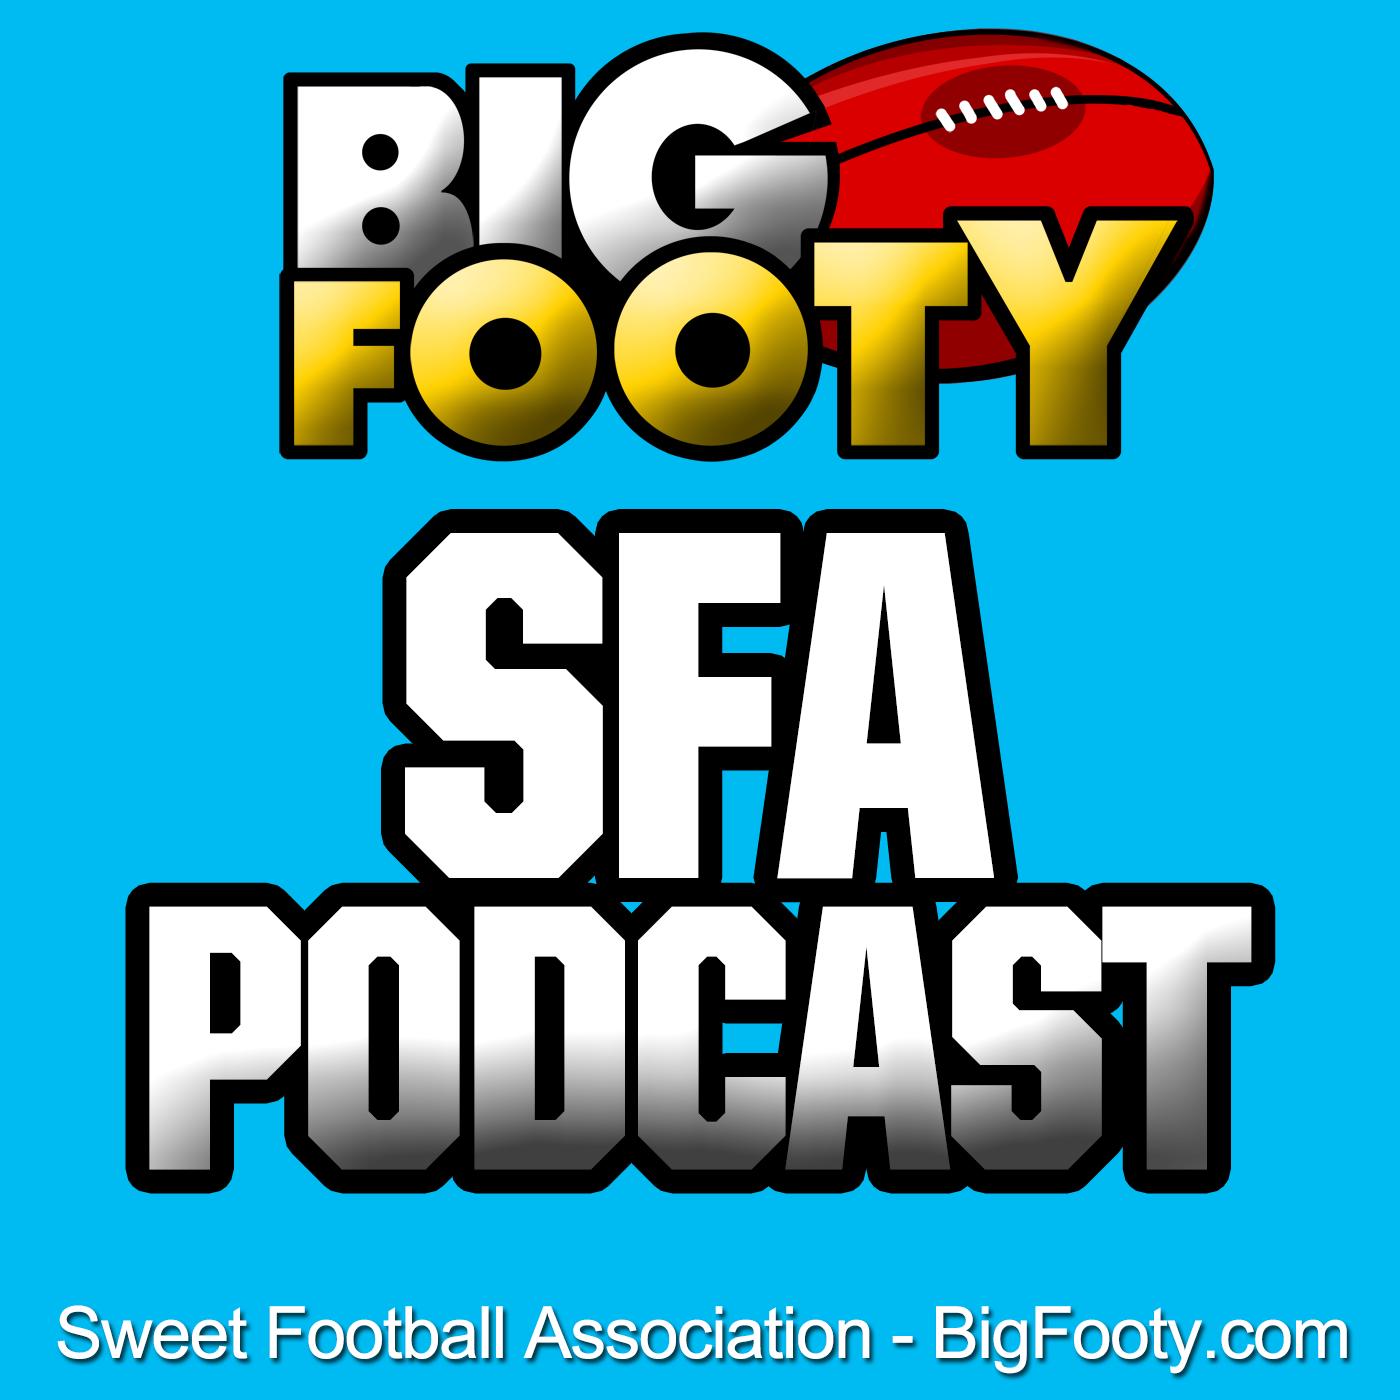 BigFooty Sweet Football Association Podcast